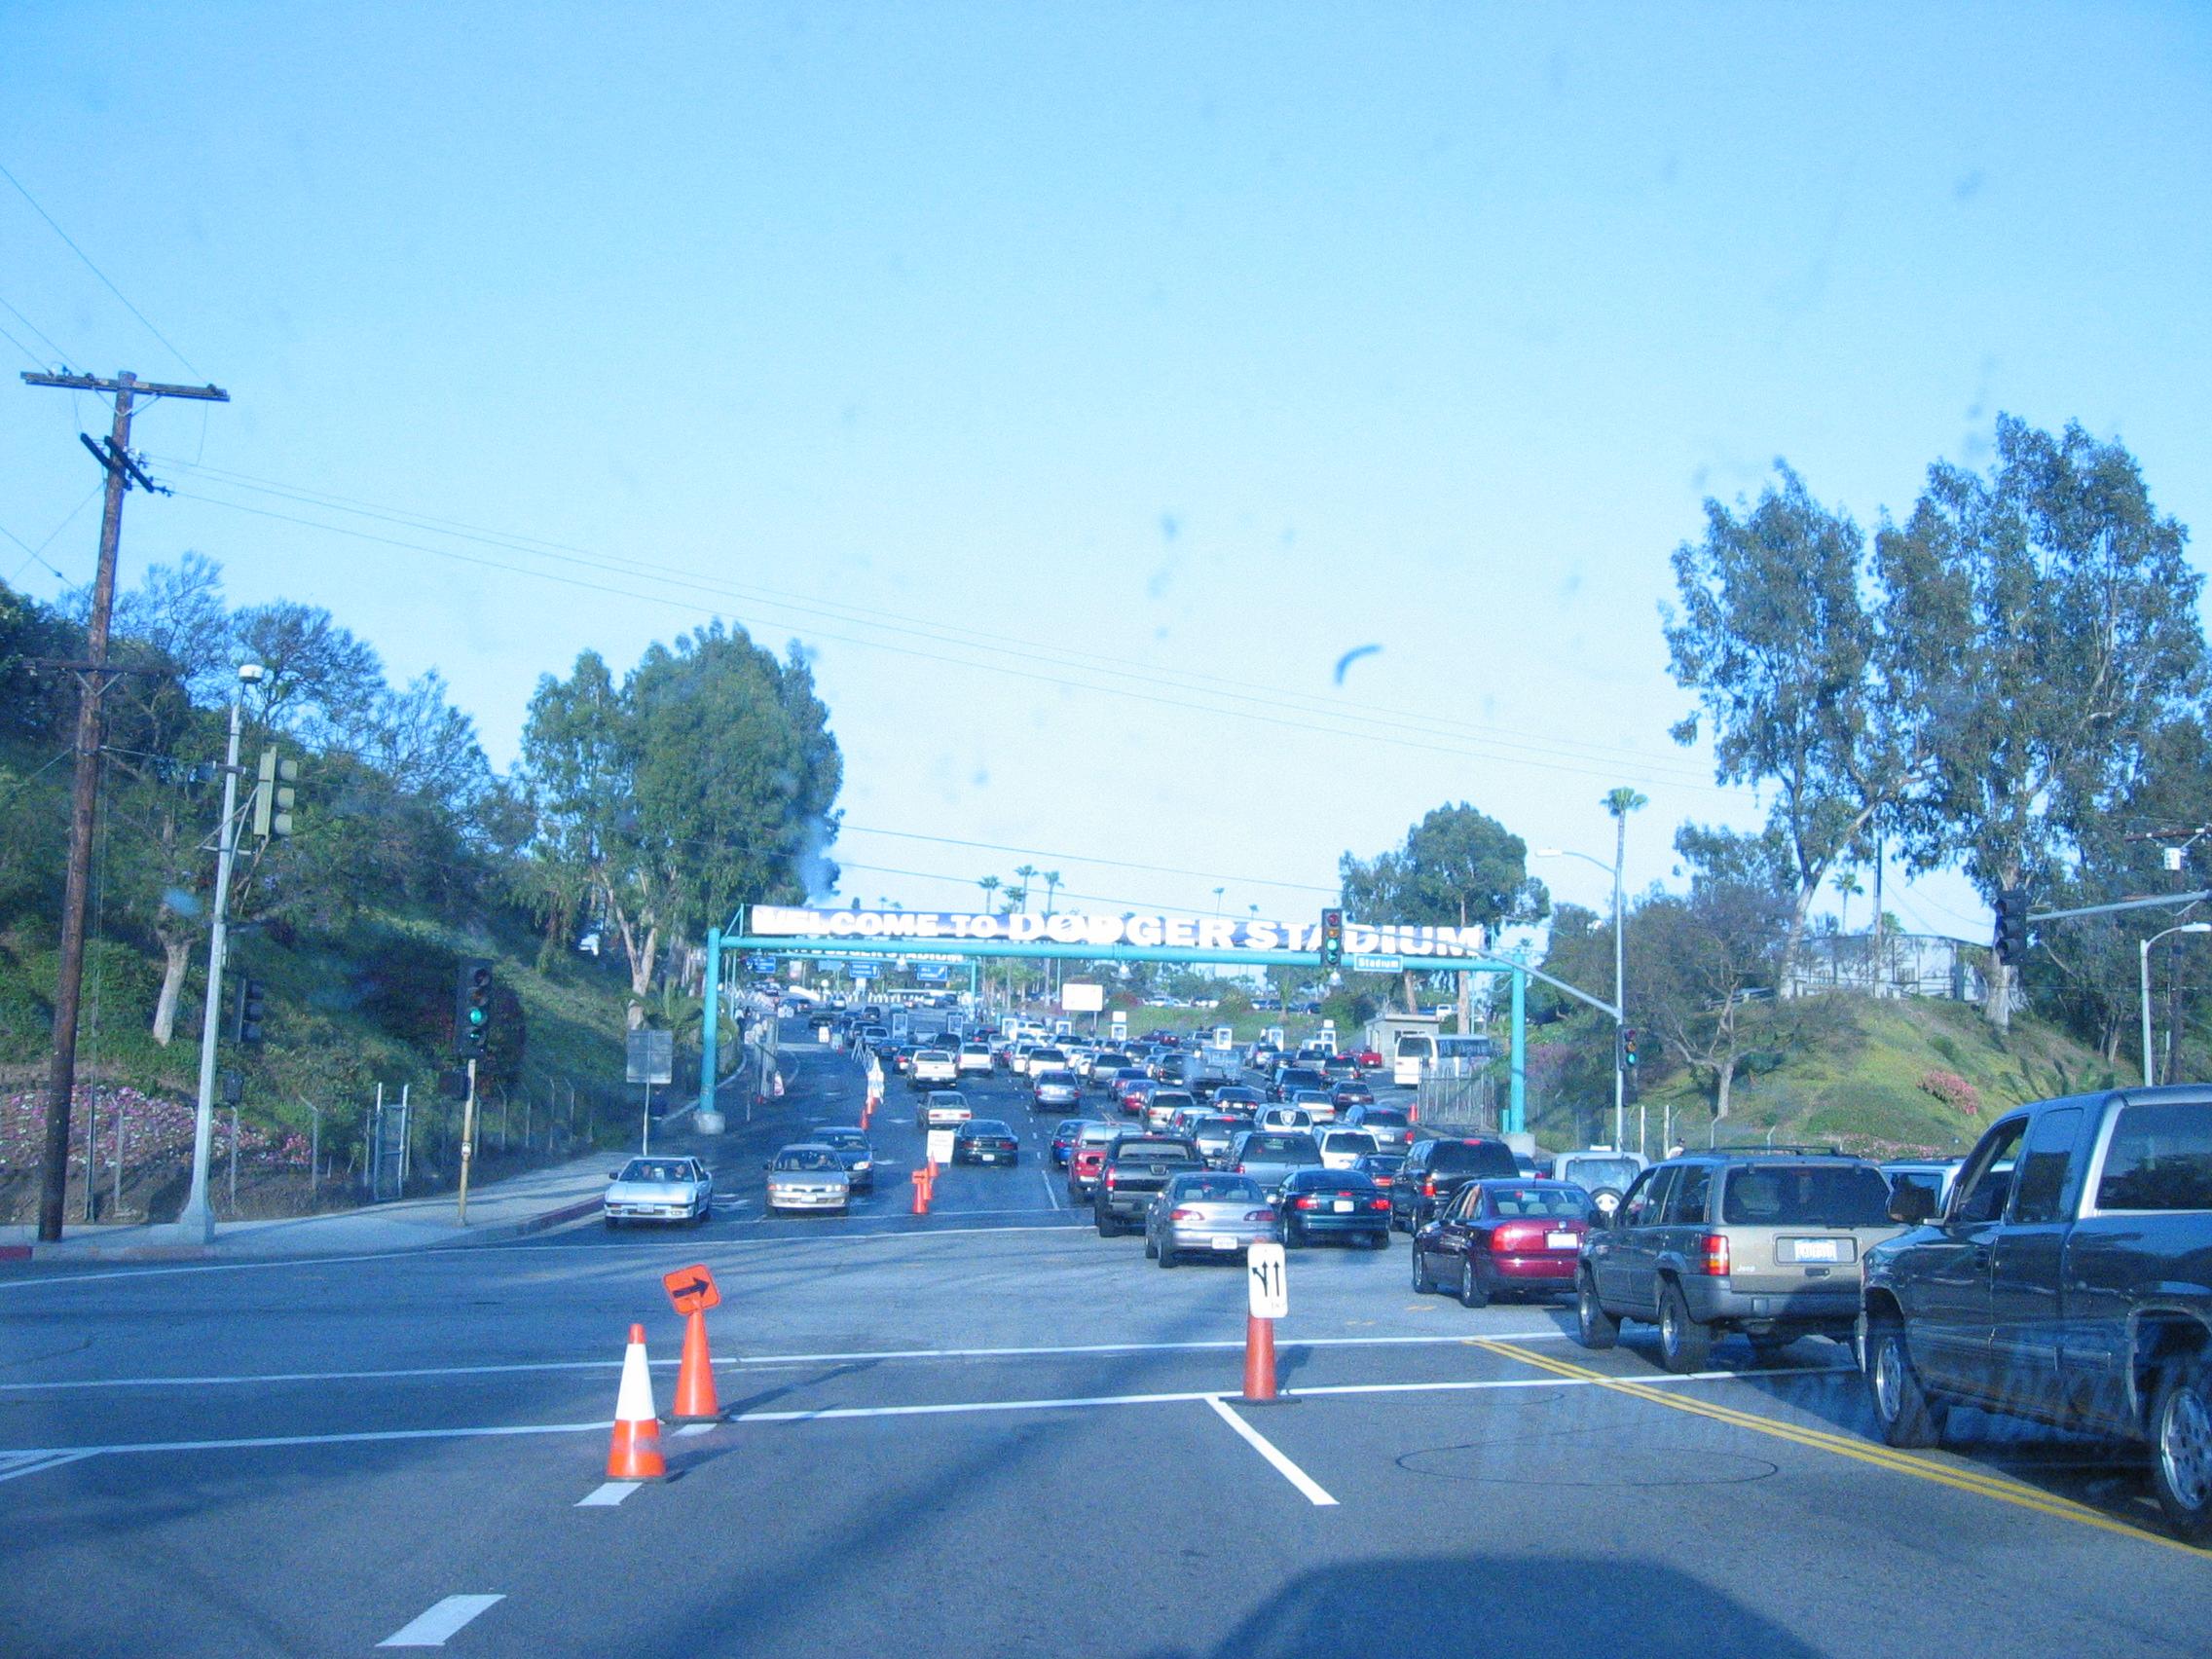 Entering Dodger Stadium